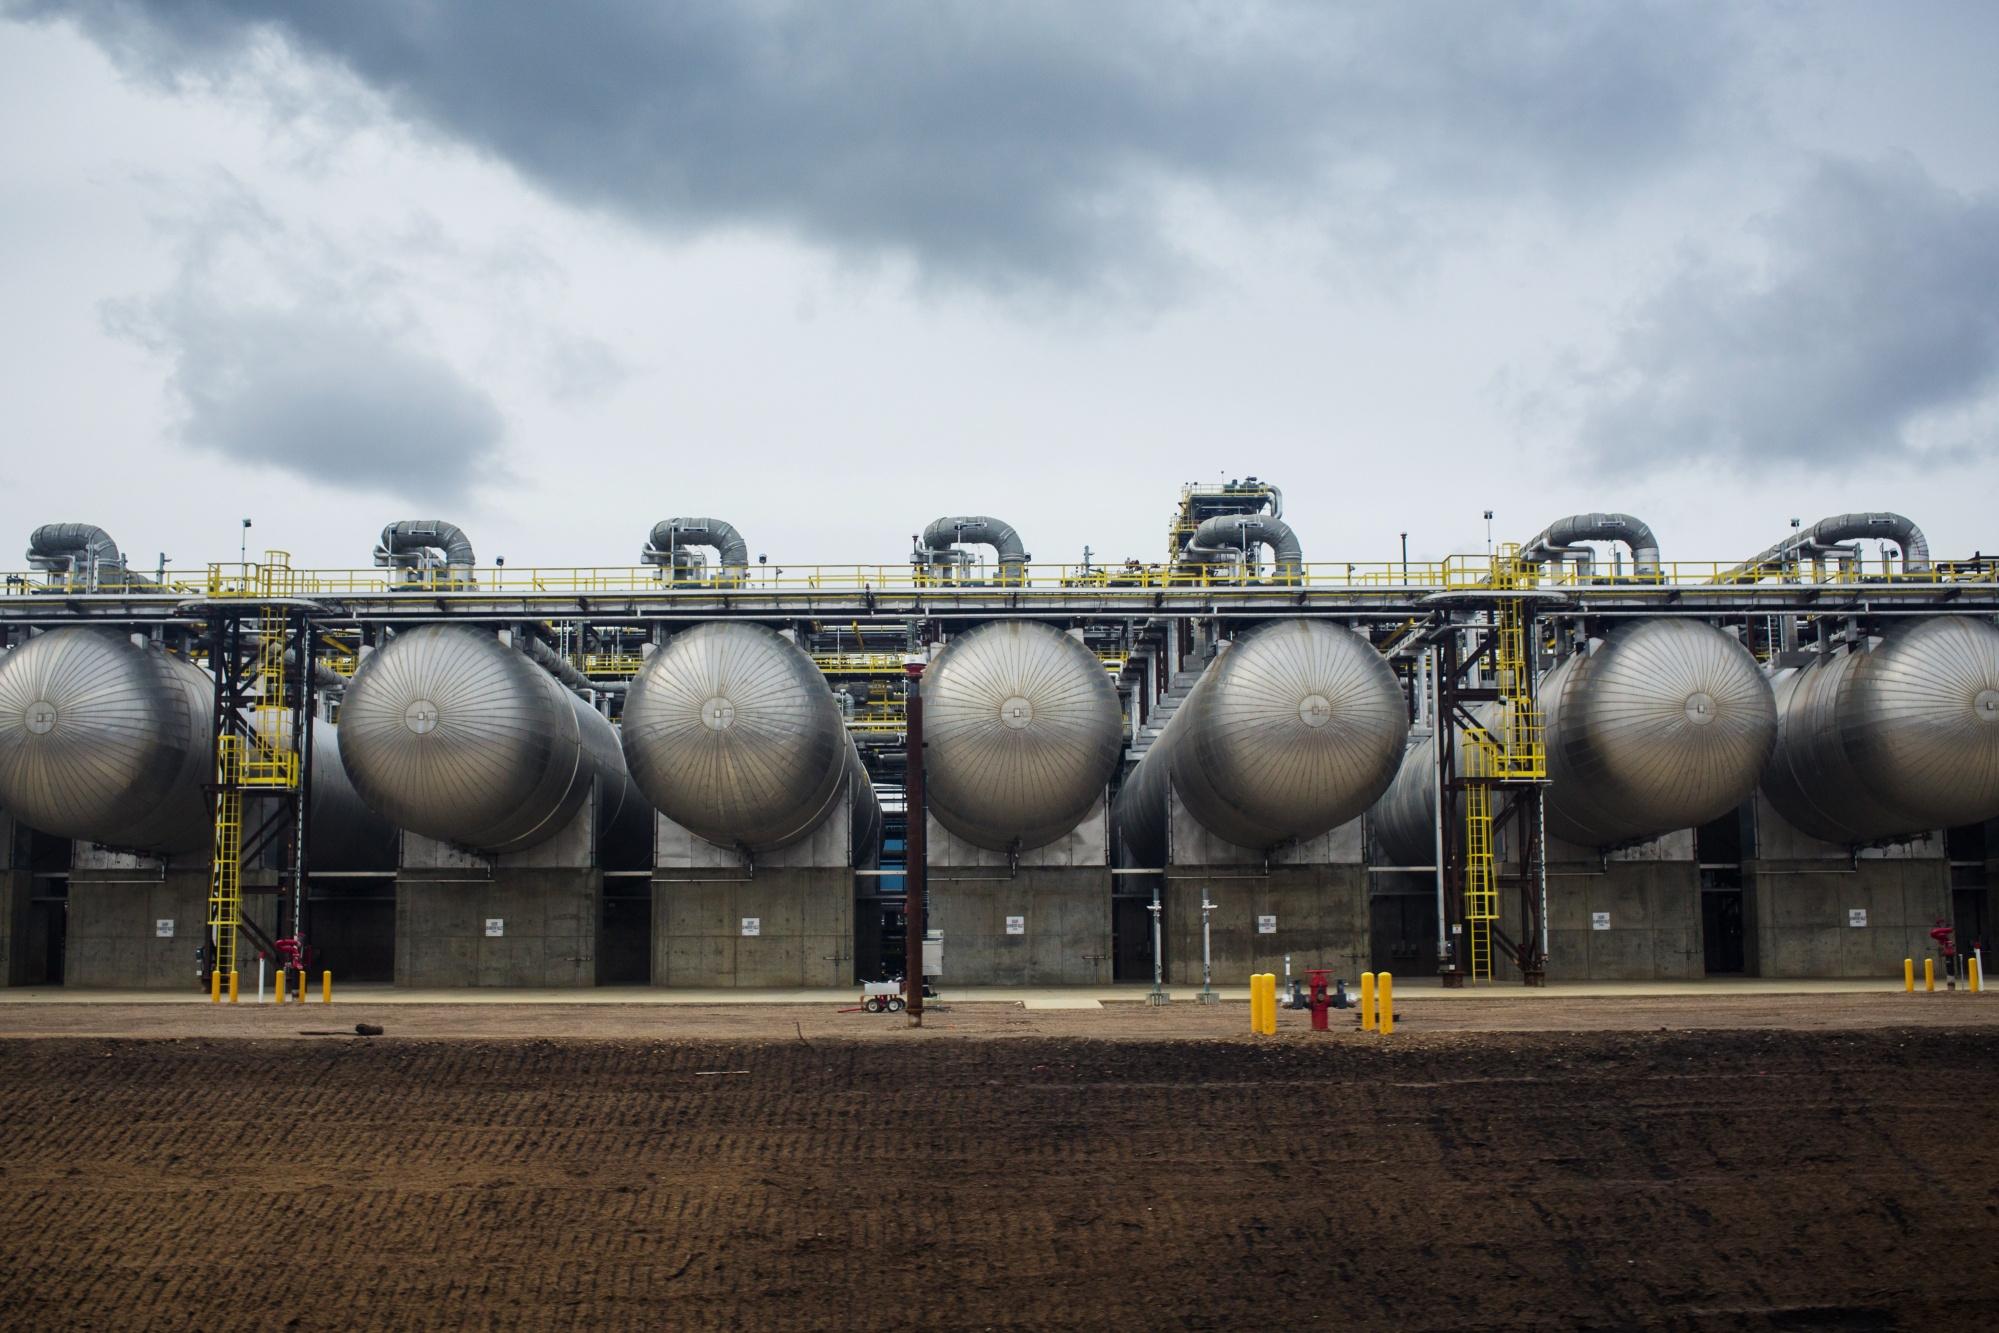 Alberta's oil cut plan boosts crude prices, stocks - BNN